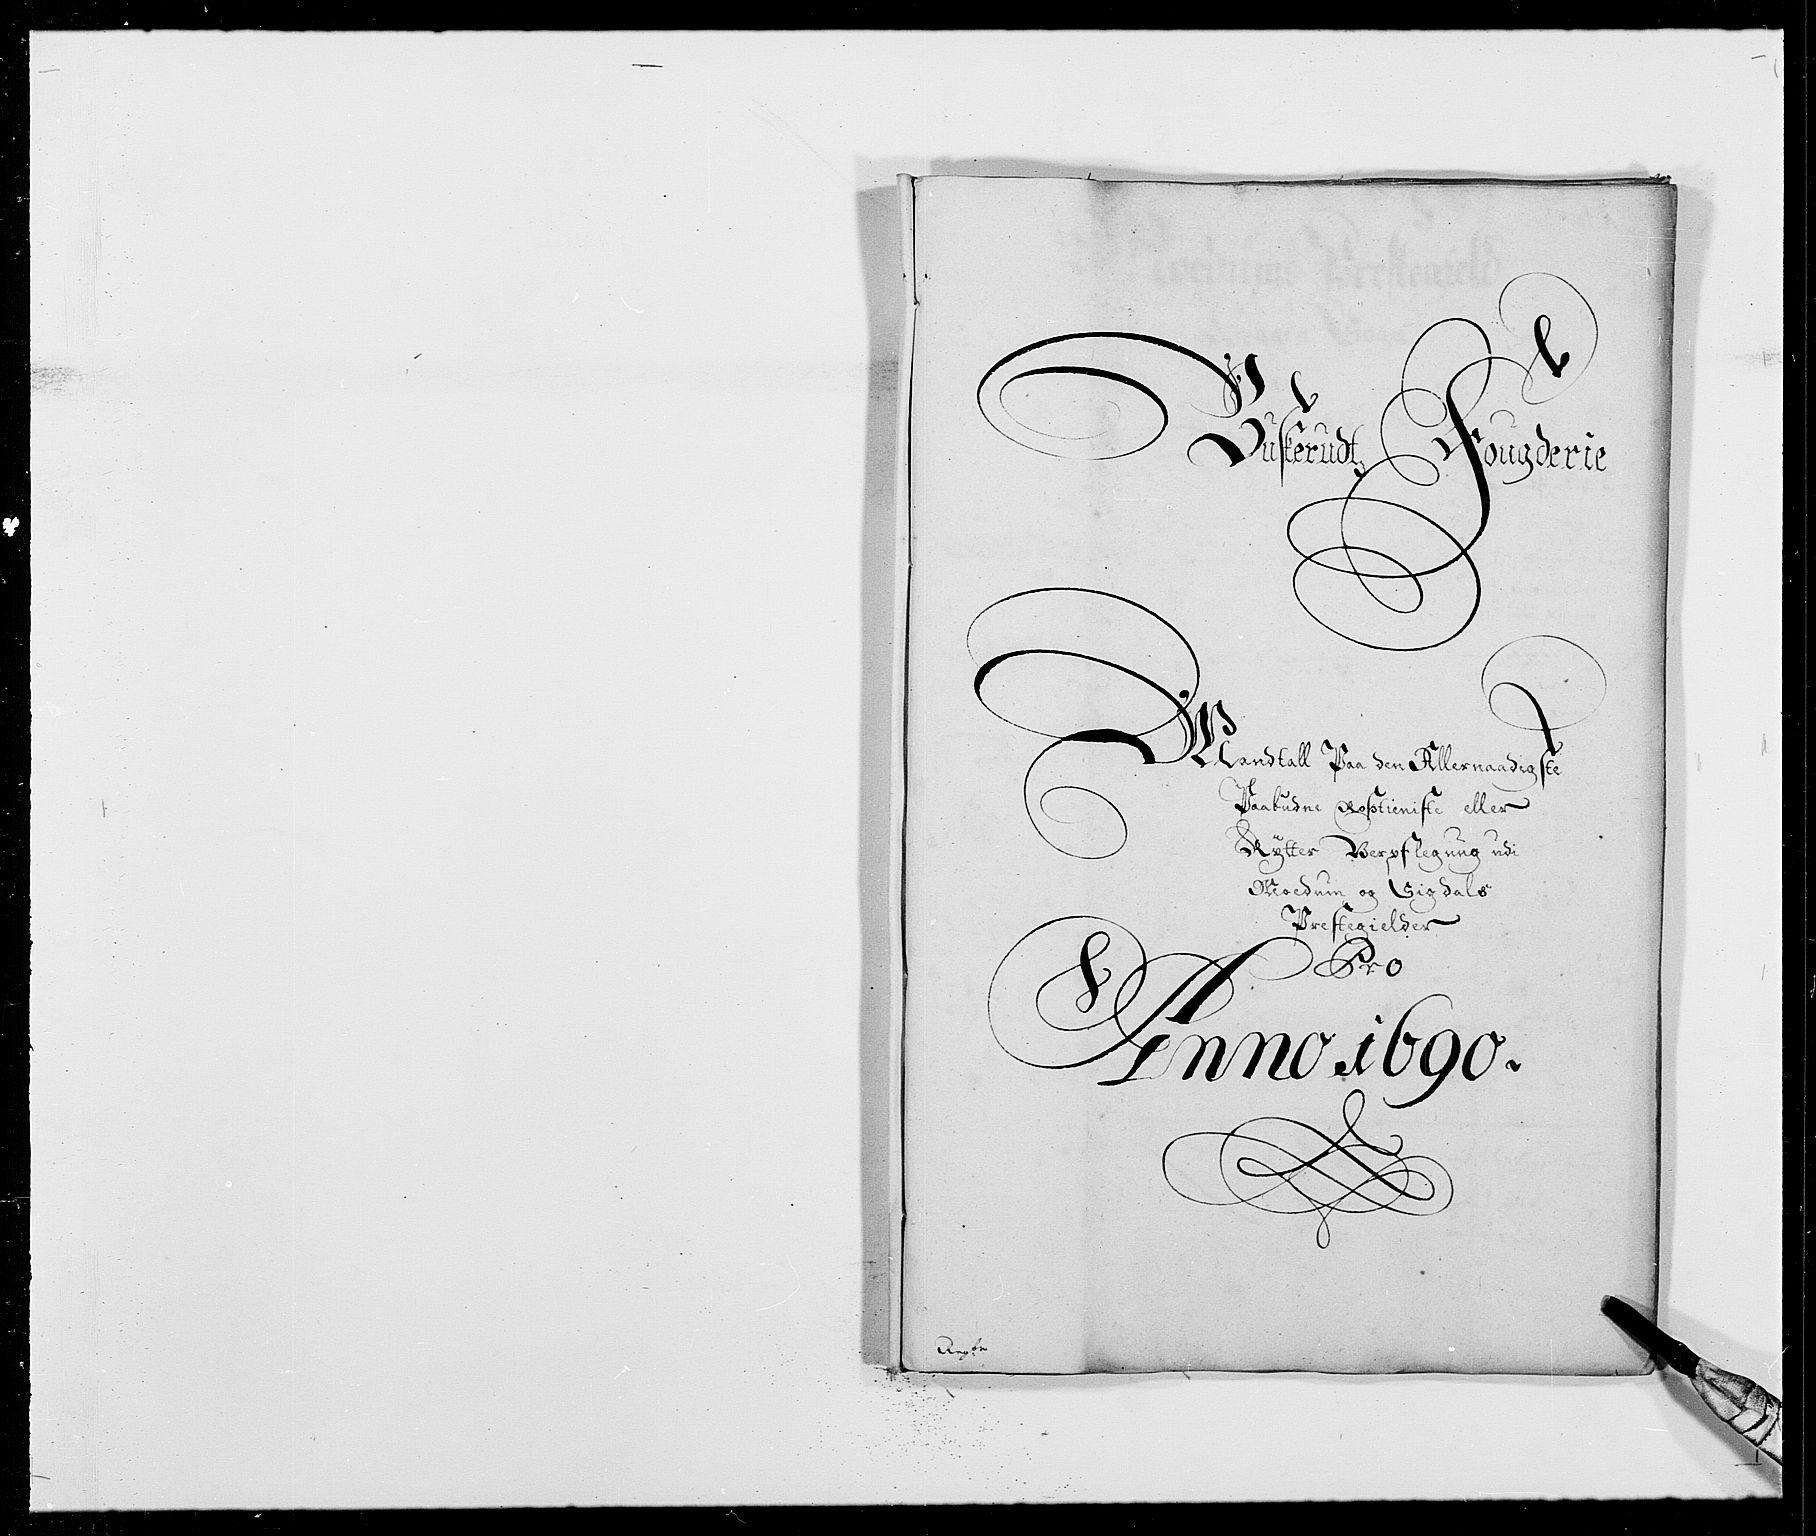 RA, Rentekammeret inntil 1814, Reviderte regnskaper, Fogderegnskap, R25/L1680: Fogderegnskap Buskerud, 1689-1690, s. 393